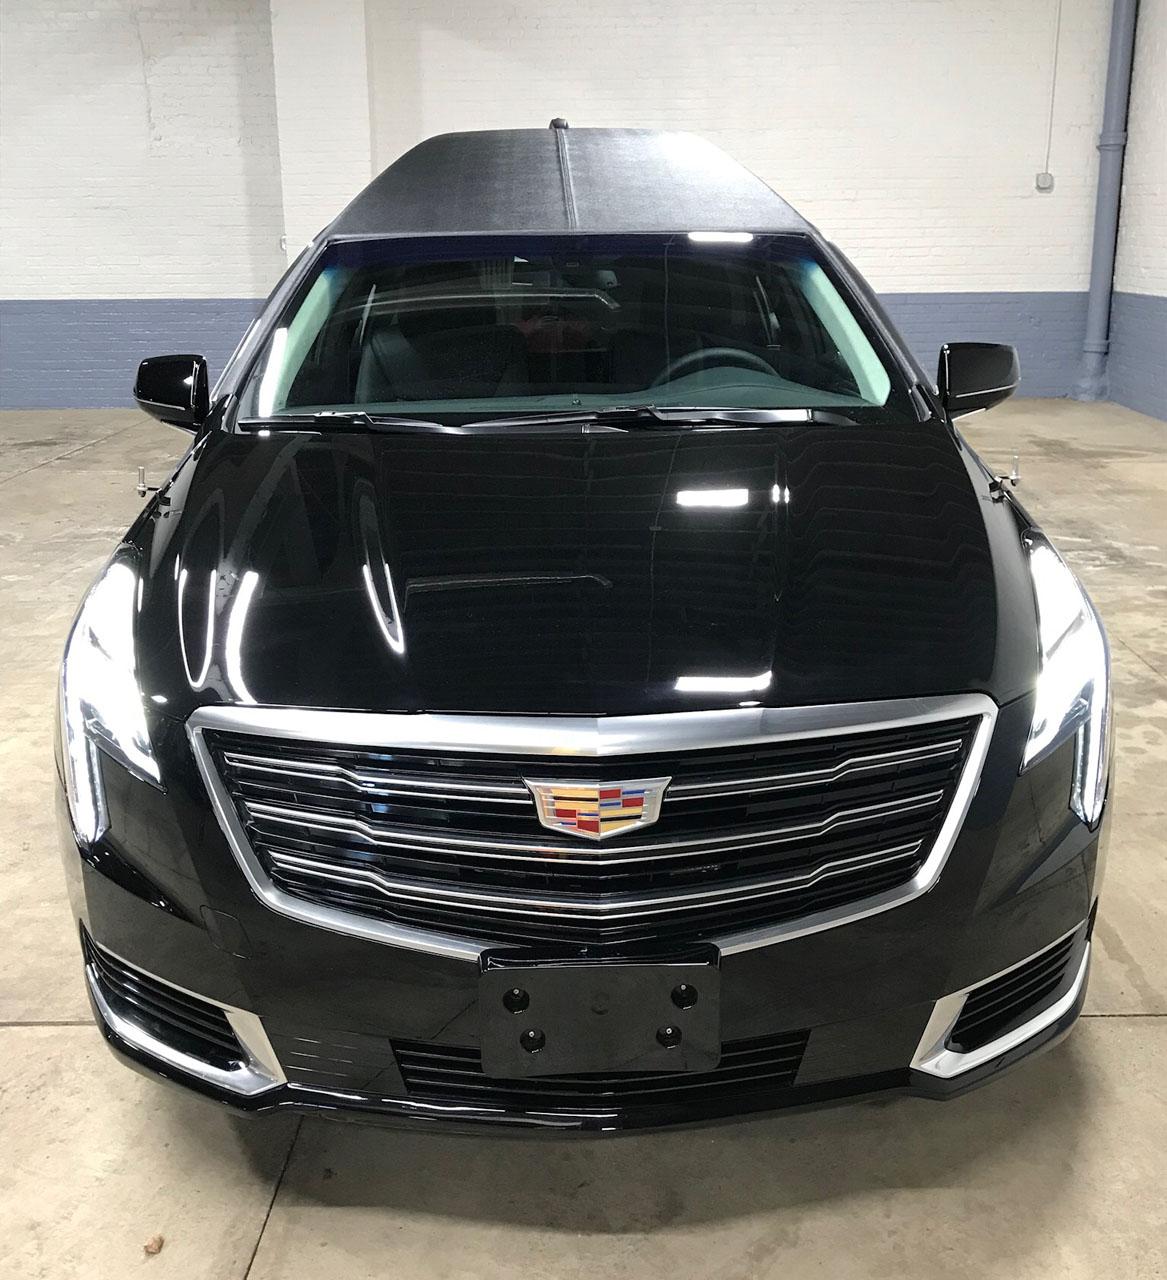 2019 Cadillac S&S Medalist Hearse